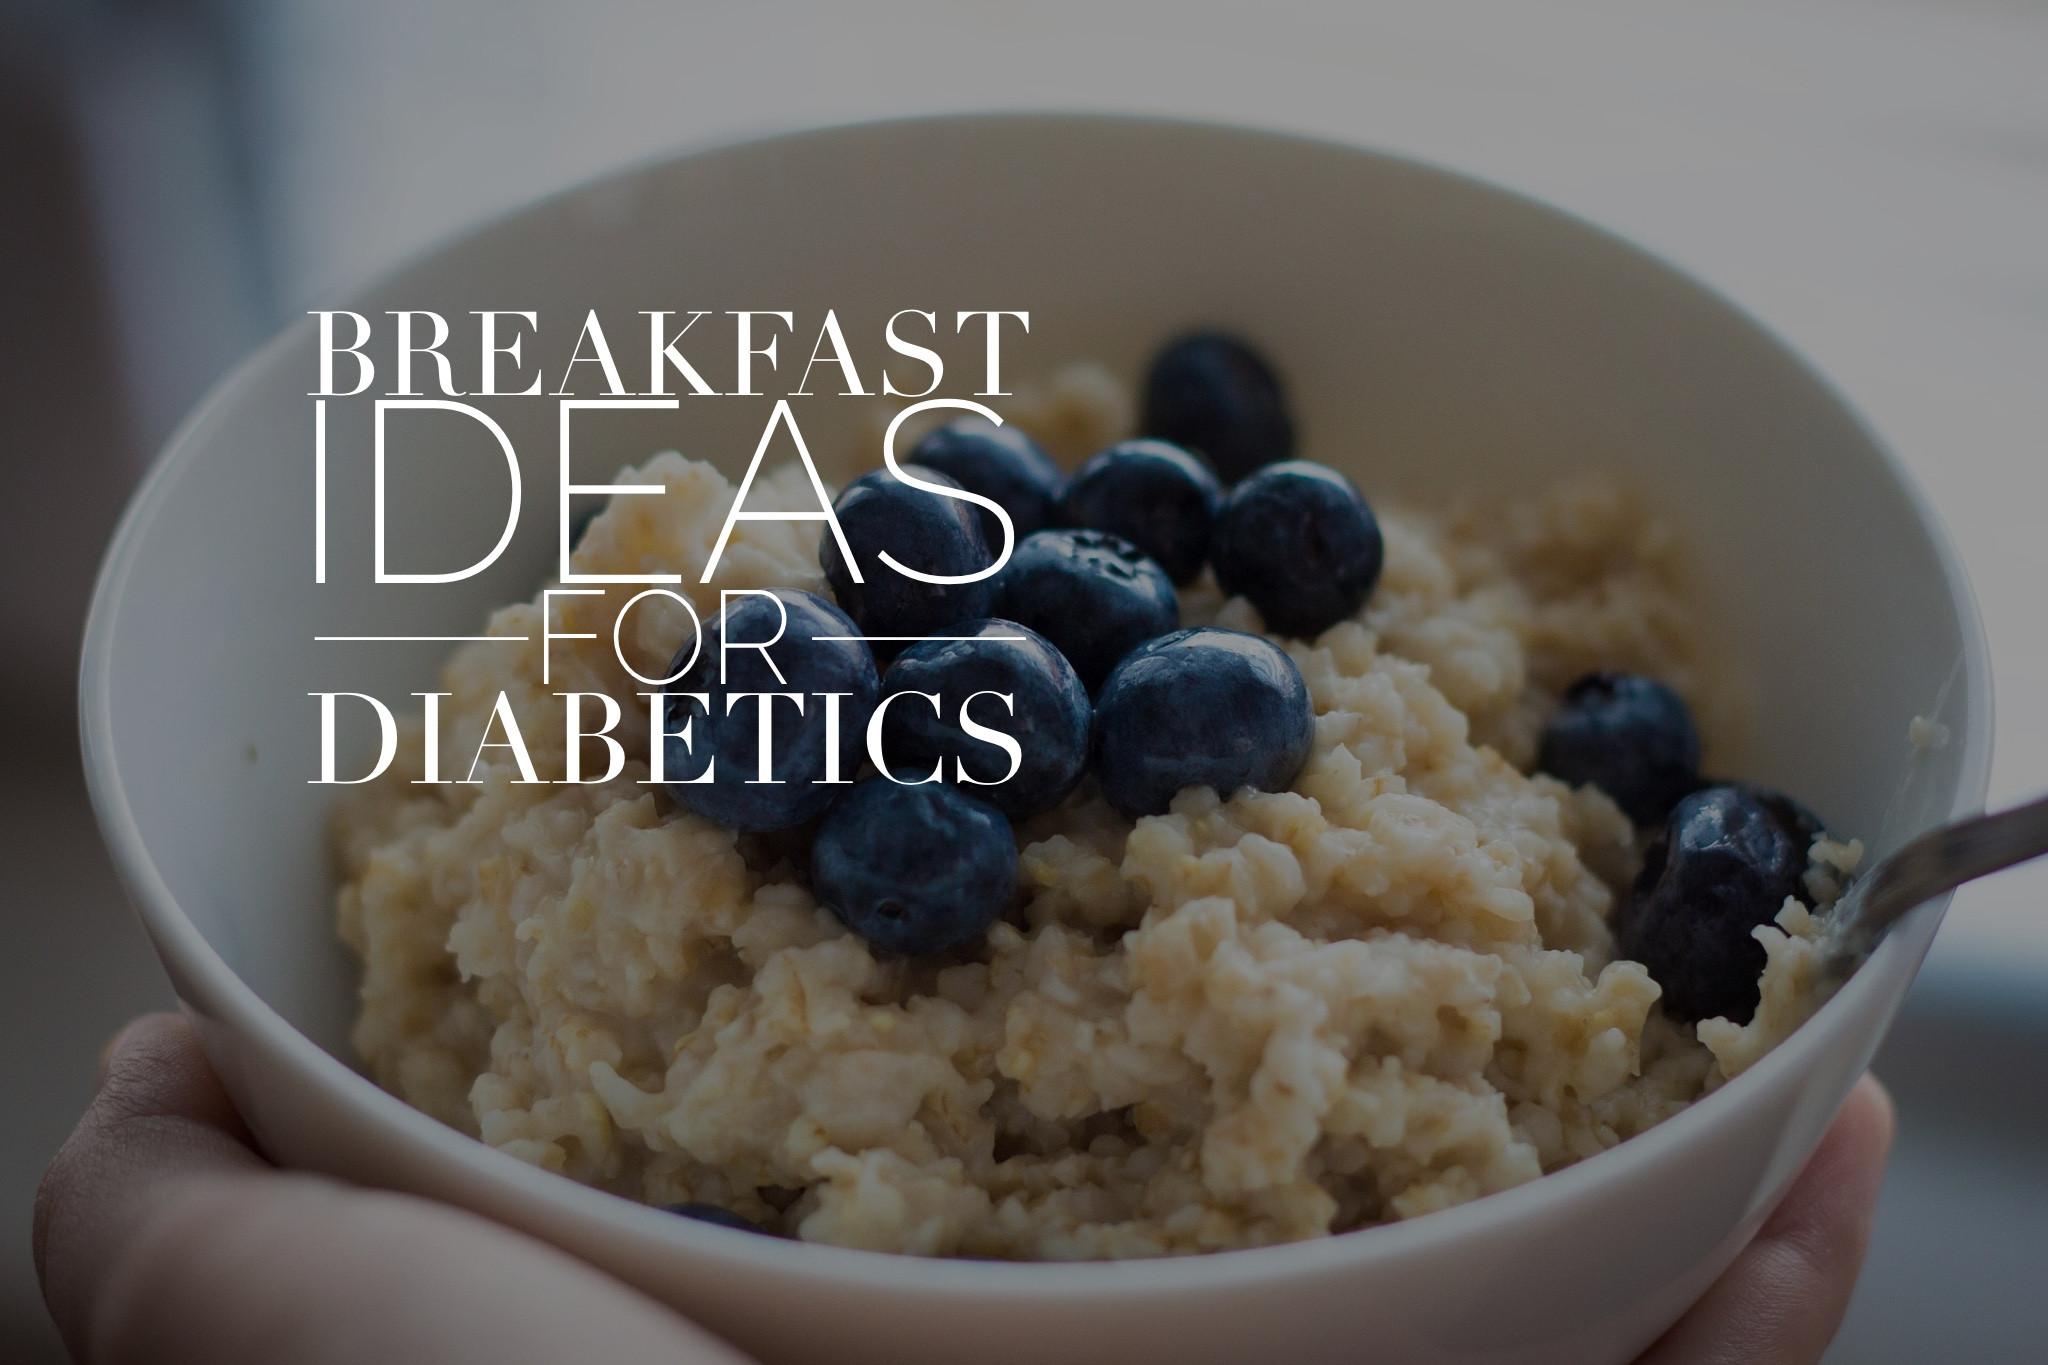 Healthy Breakfast Recipes For Diabetics  The Building Blocks of a Great Breakfast Healthy Diet